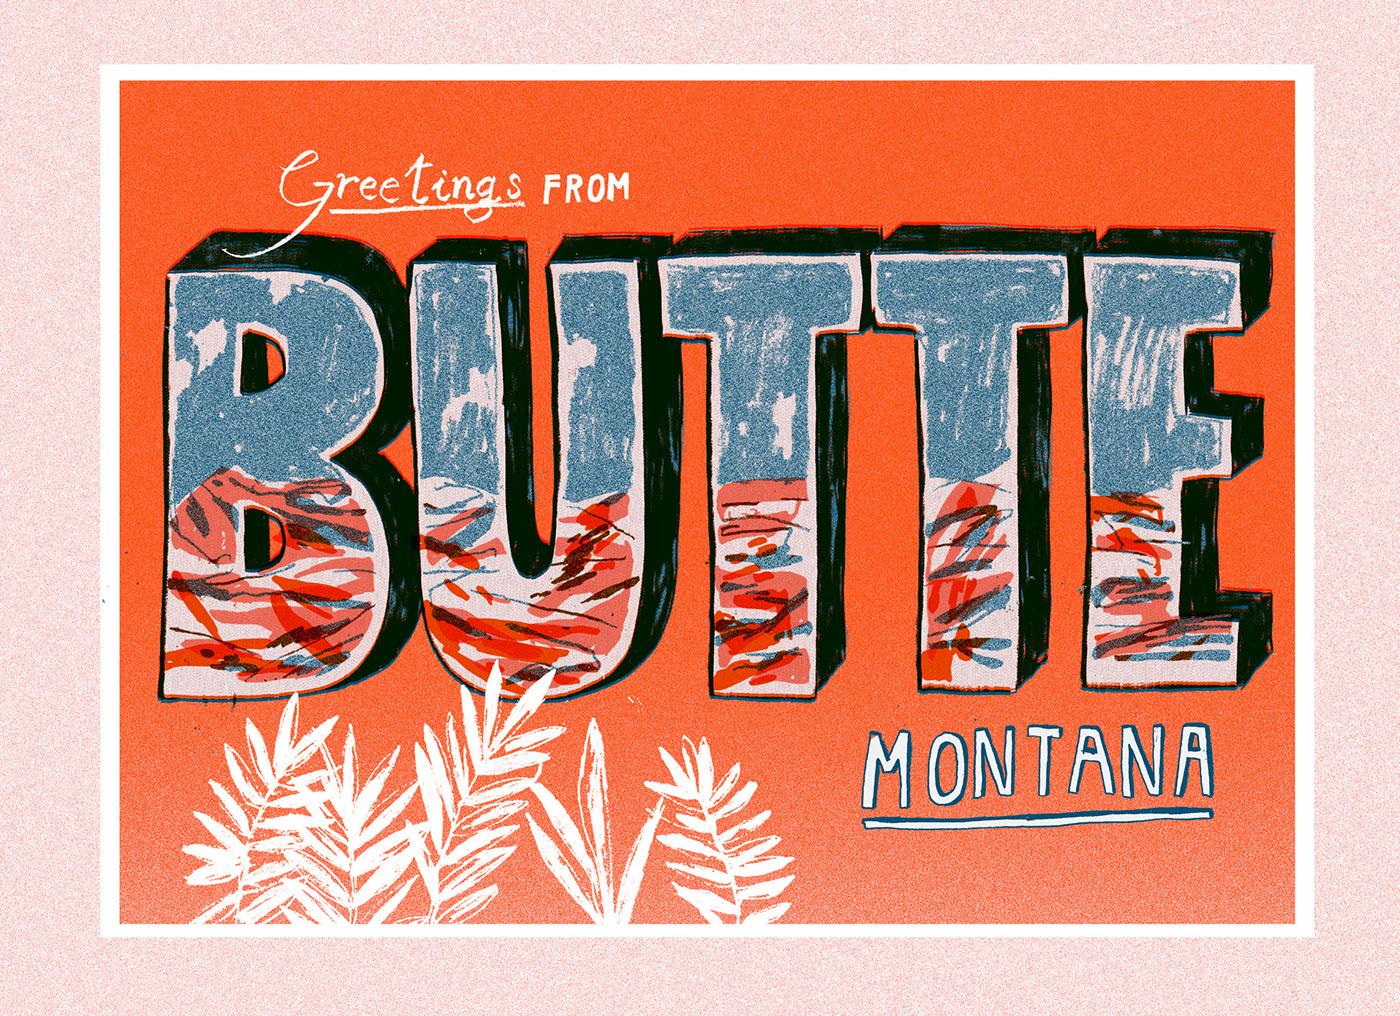 Montana girl adventure butte geese pantone berkeley orange blue